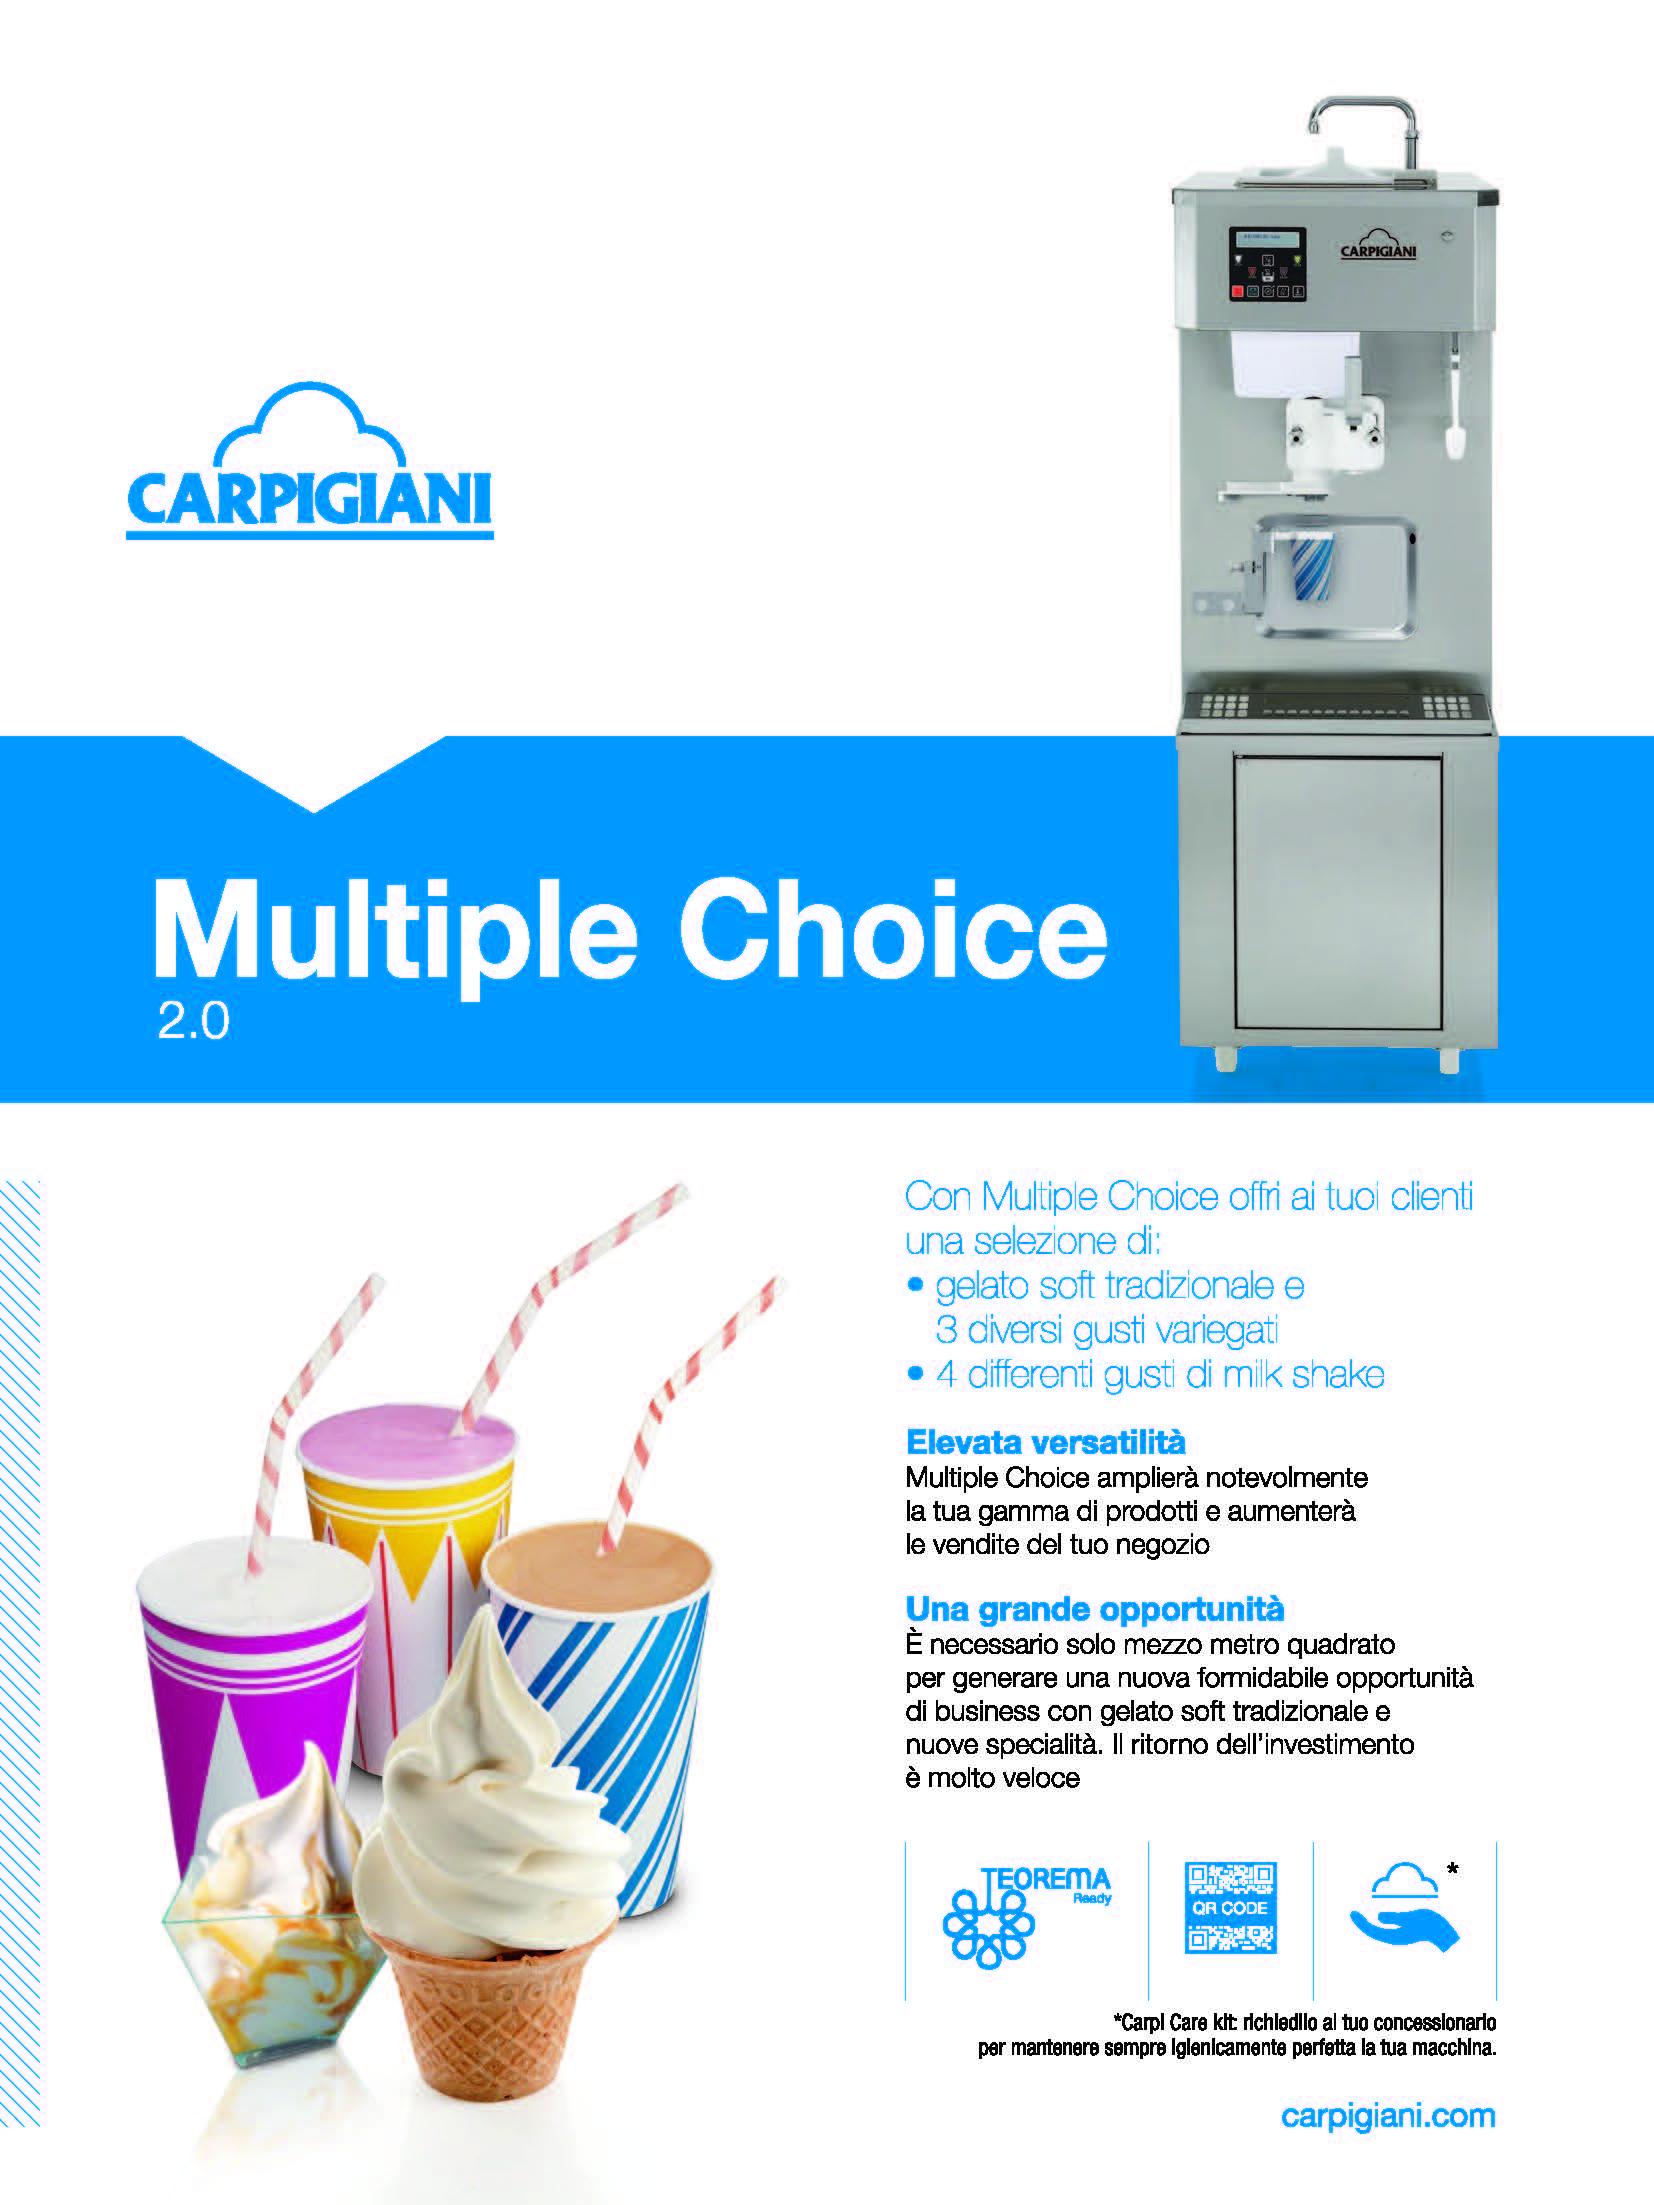 Carpigiani – Multiple Choice